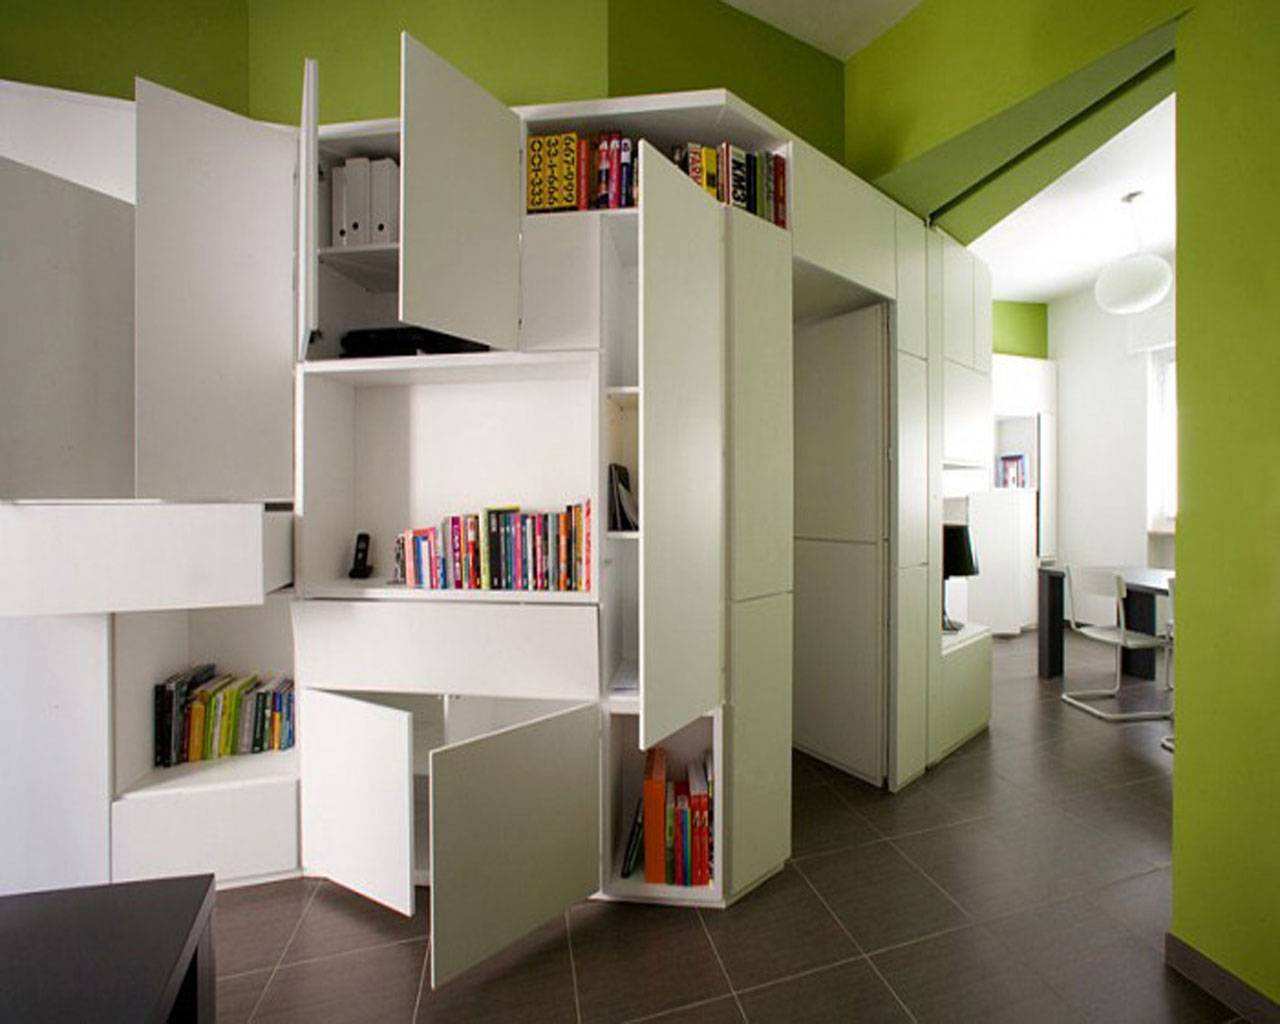 Kidkraft-wall-storage-unit-canada